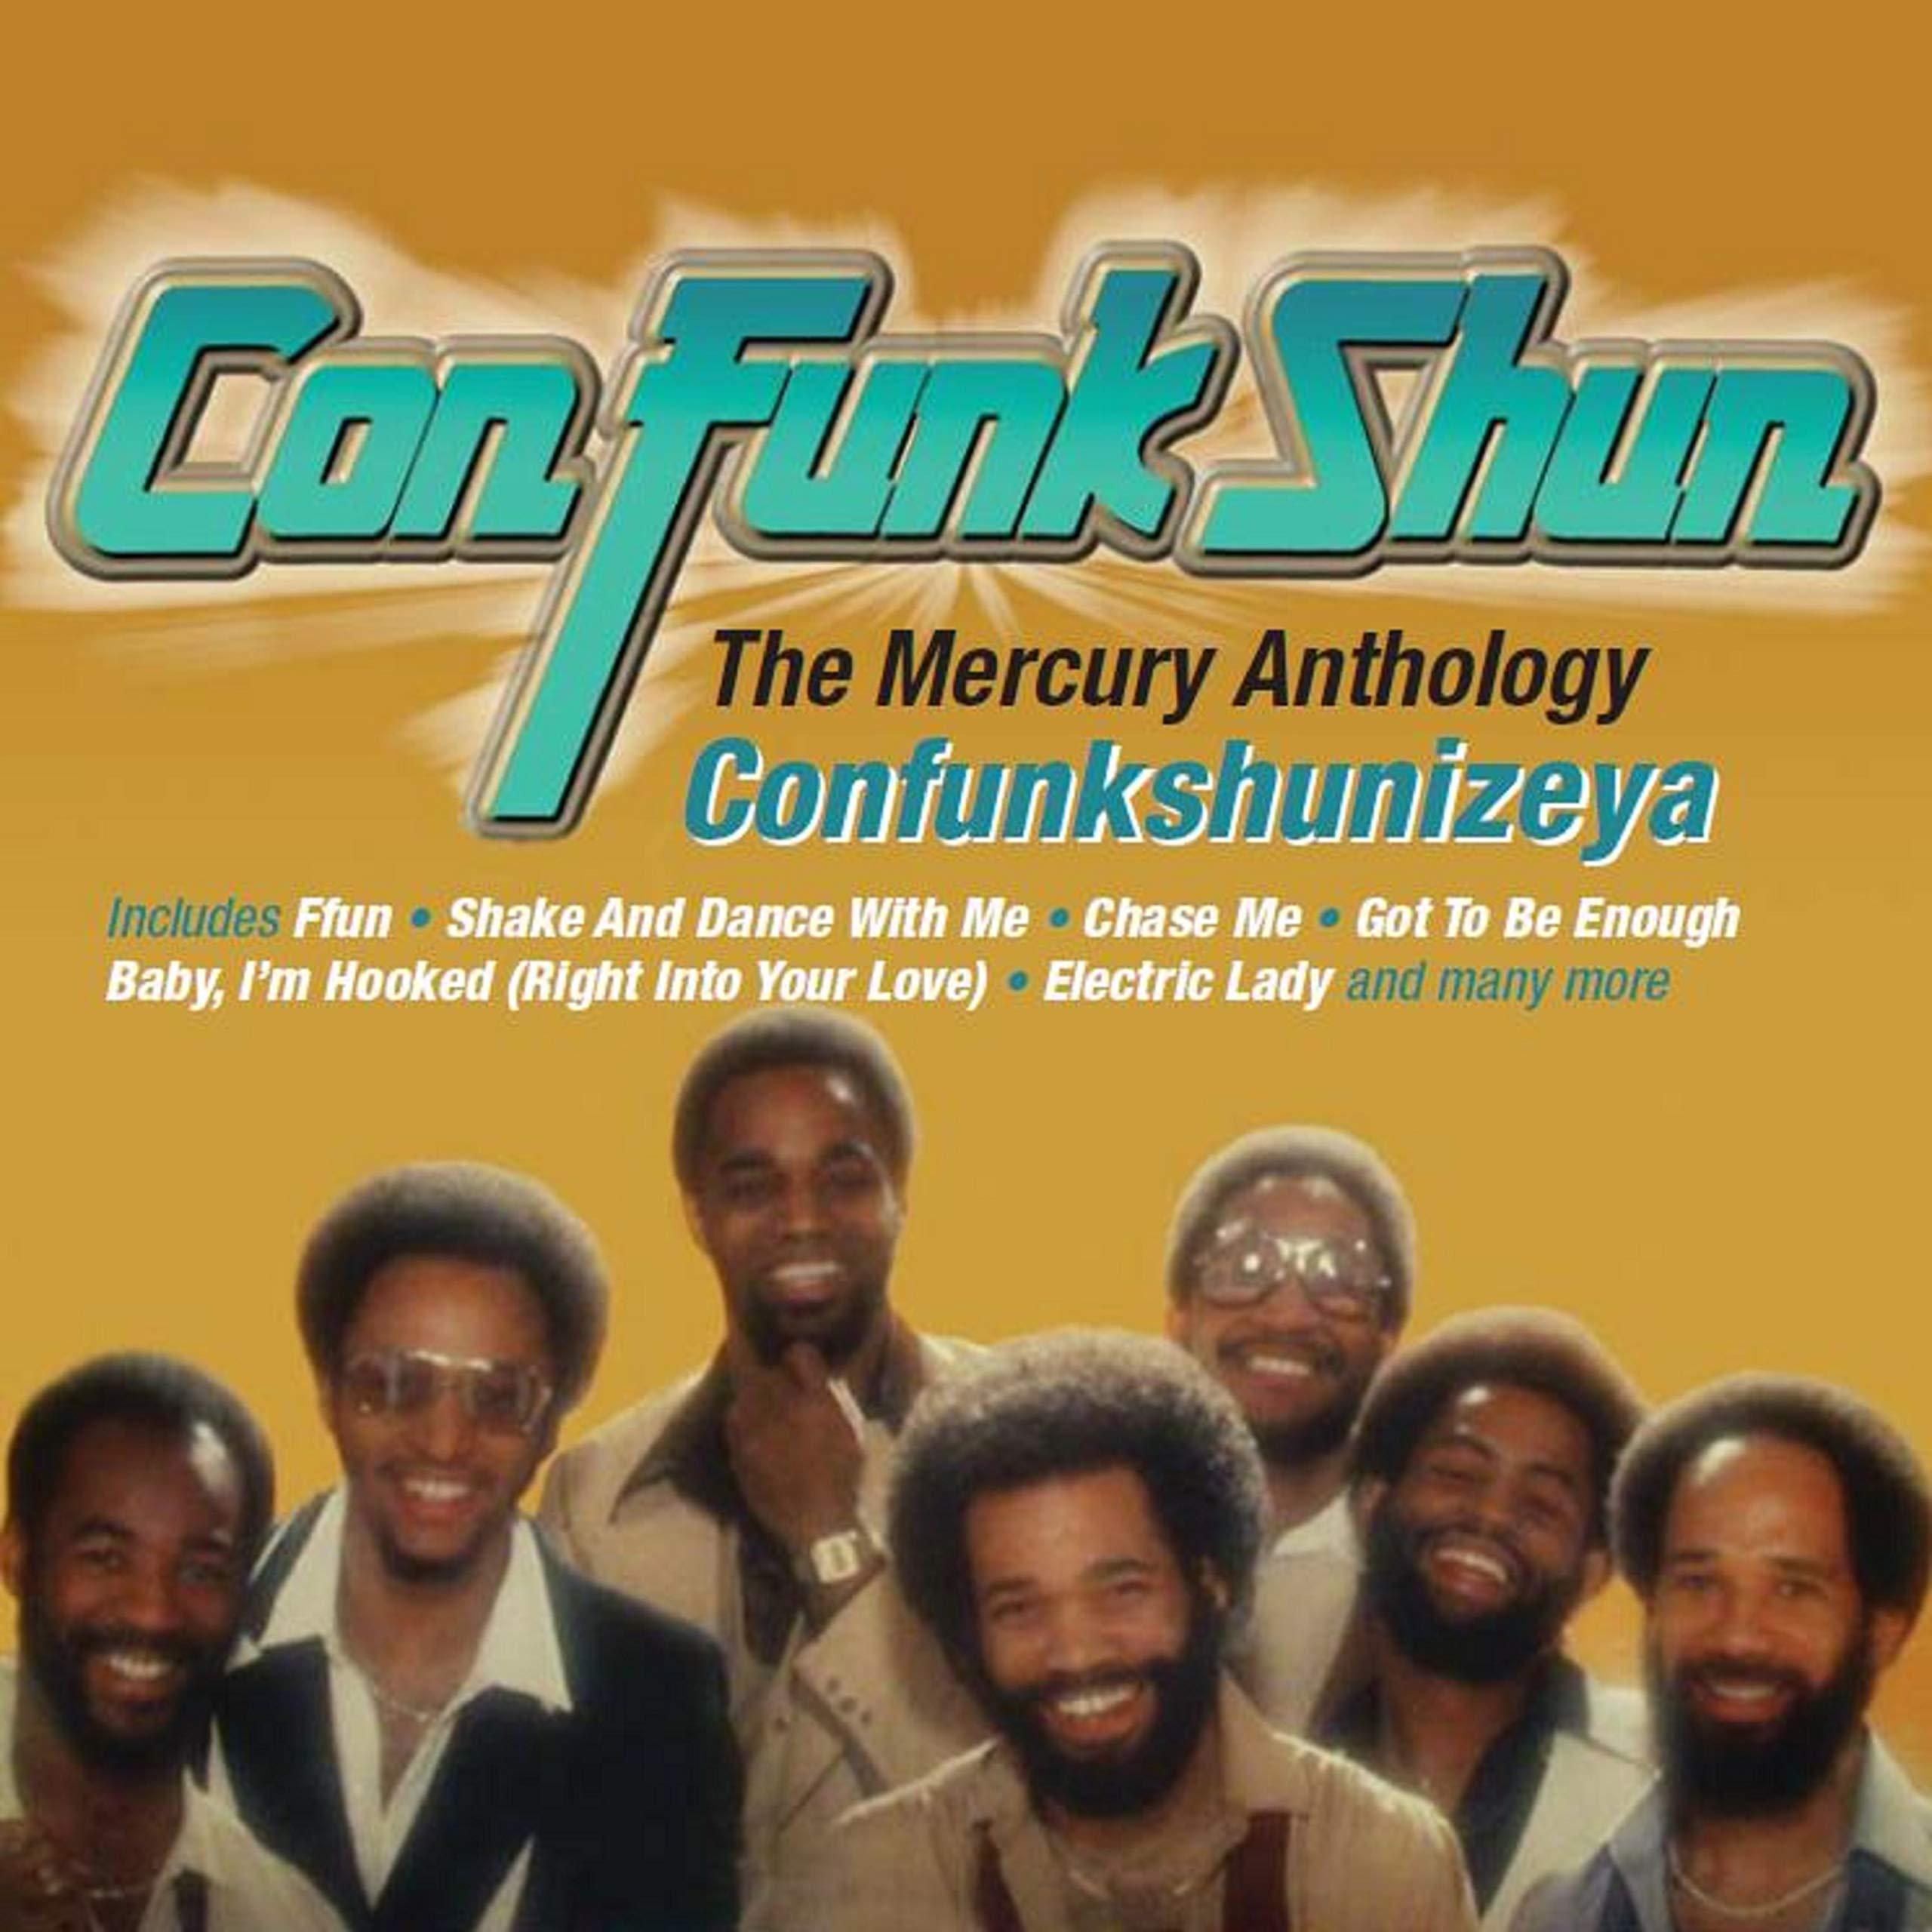 Con Funk Shun – Confunkshunizeya  The Mercury Anthology (2020) [FLAC]